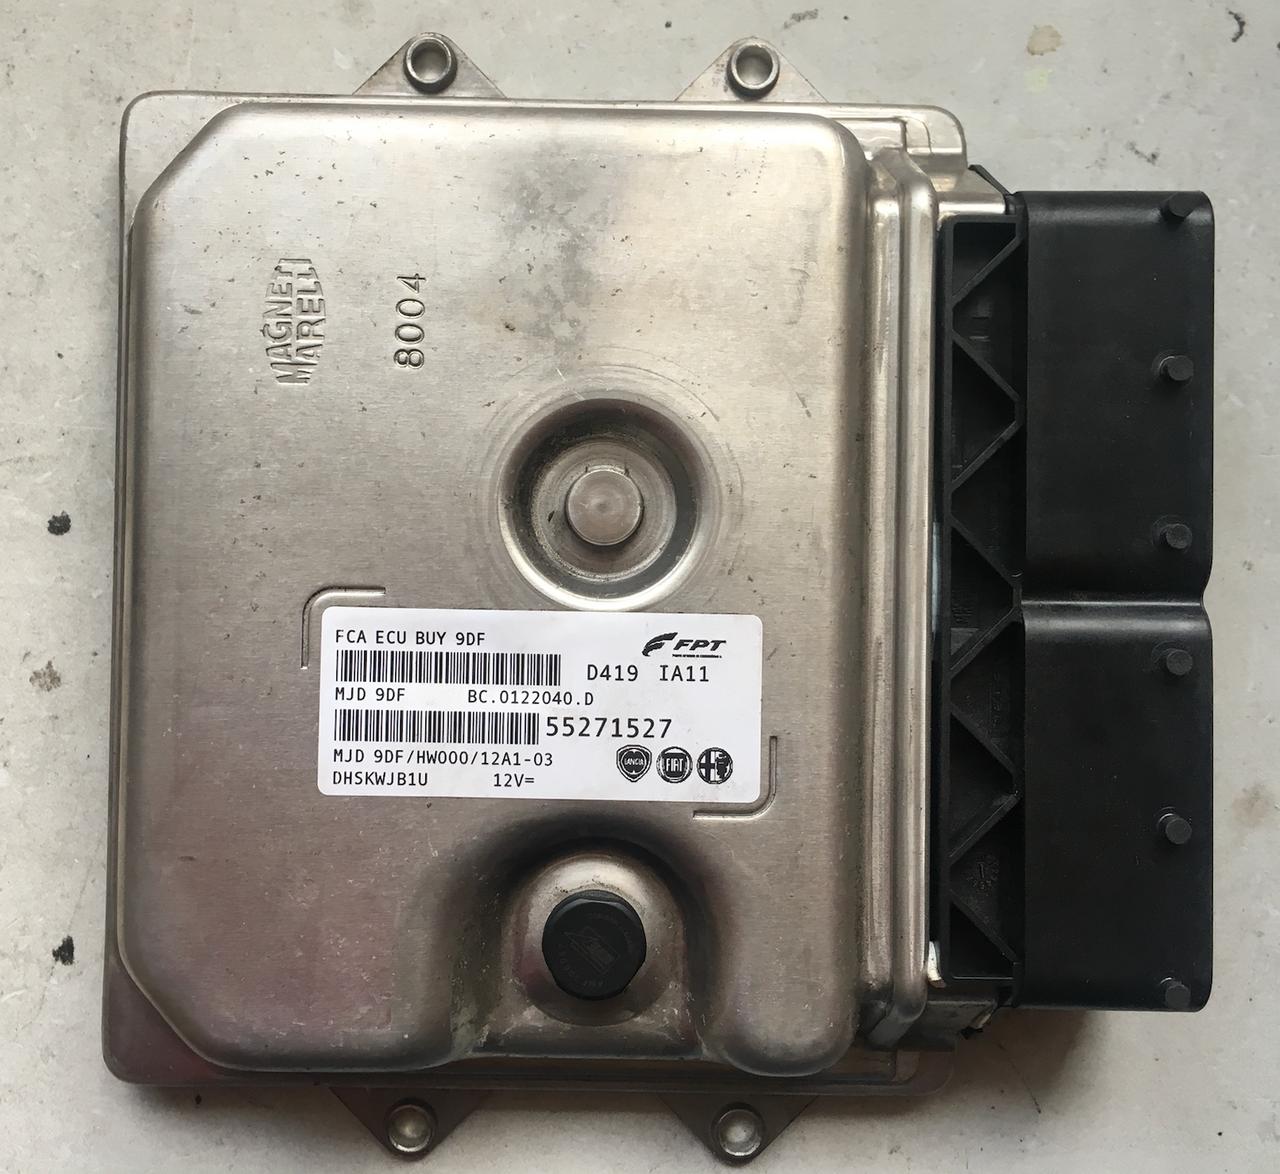 FPT Engine ECU, Fiat Doblo, MJD 9DF, BC.0122040.D, 55271527